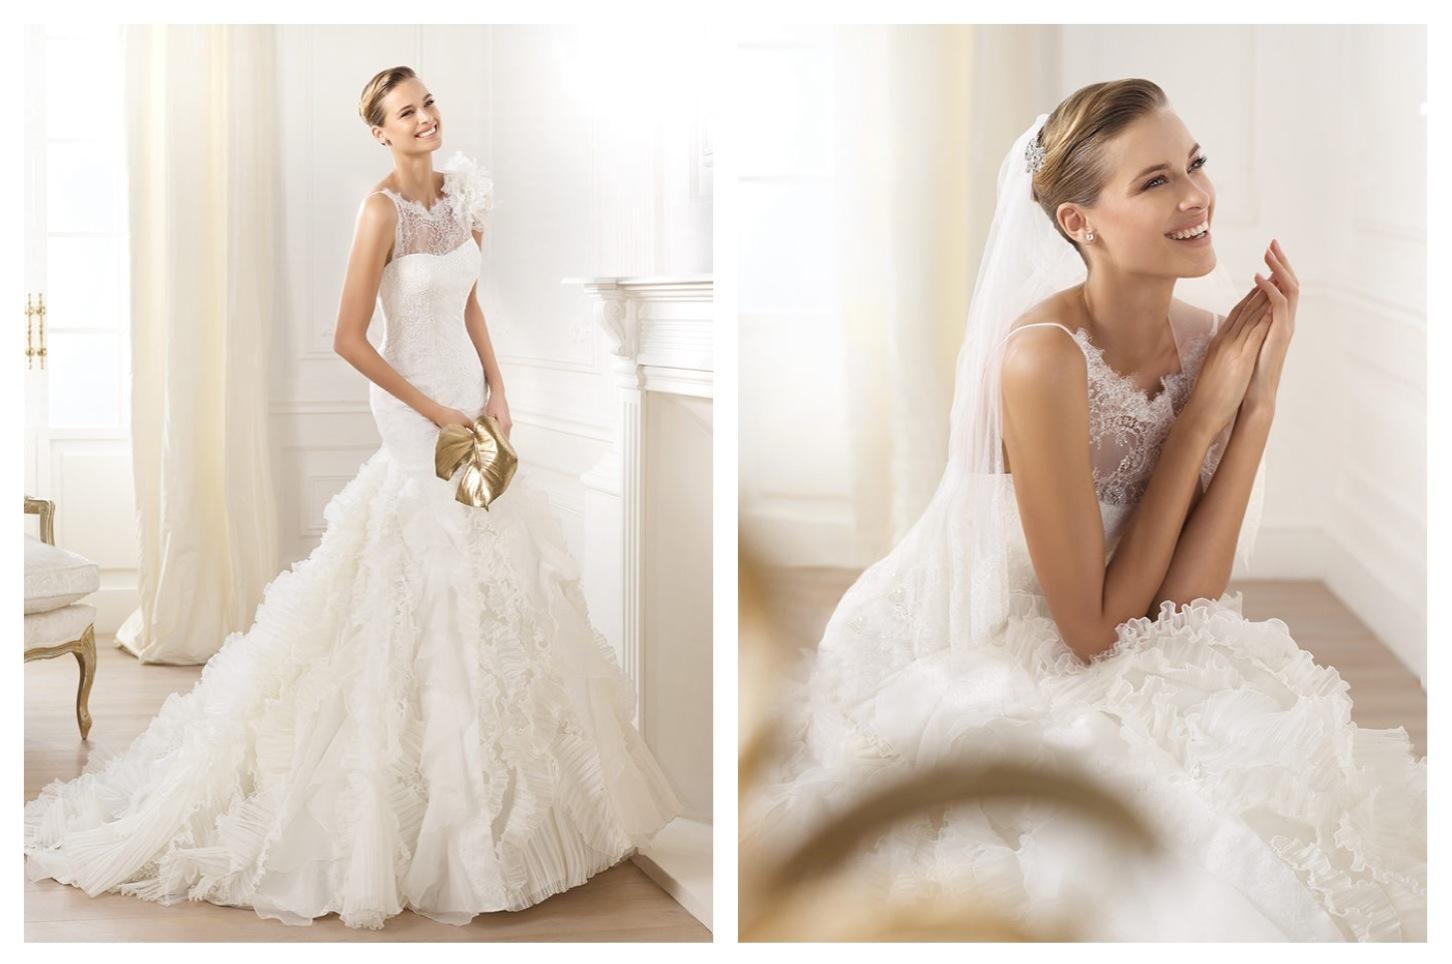 pronovias-wedding-dress-pre-2014-bridal-dreams-collection-leandra ...